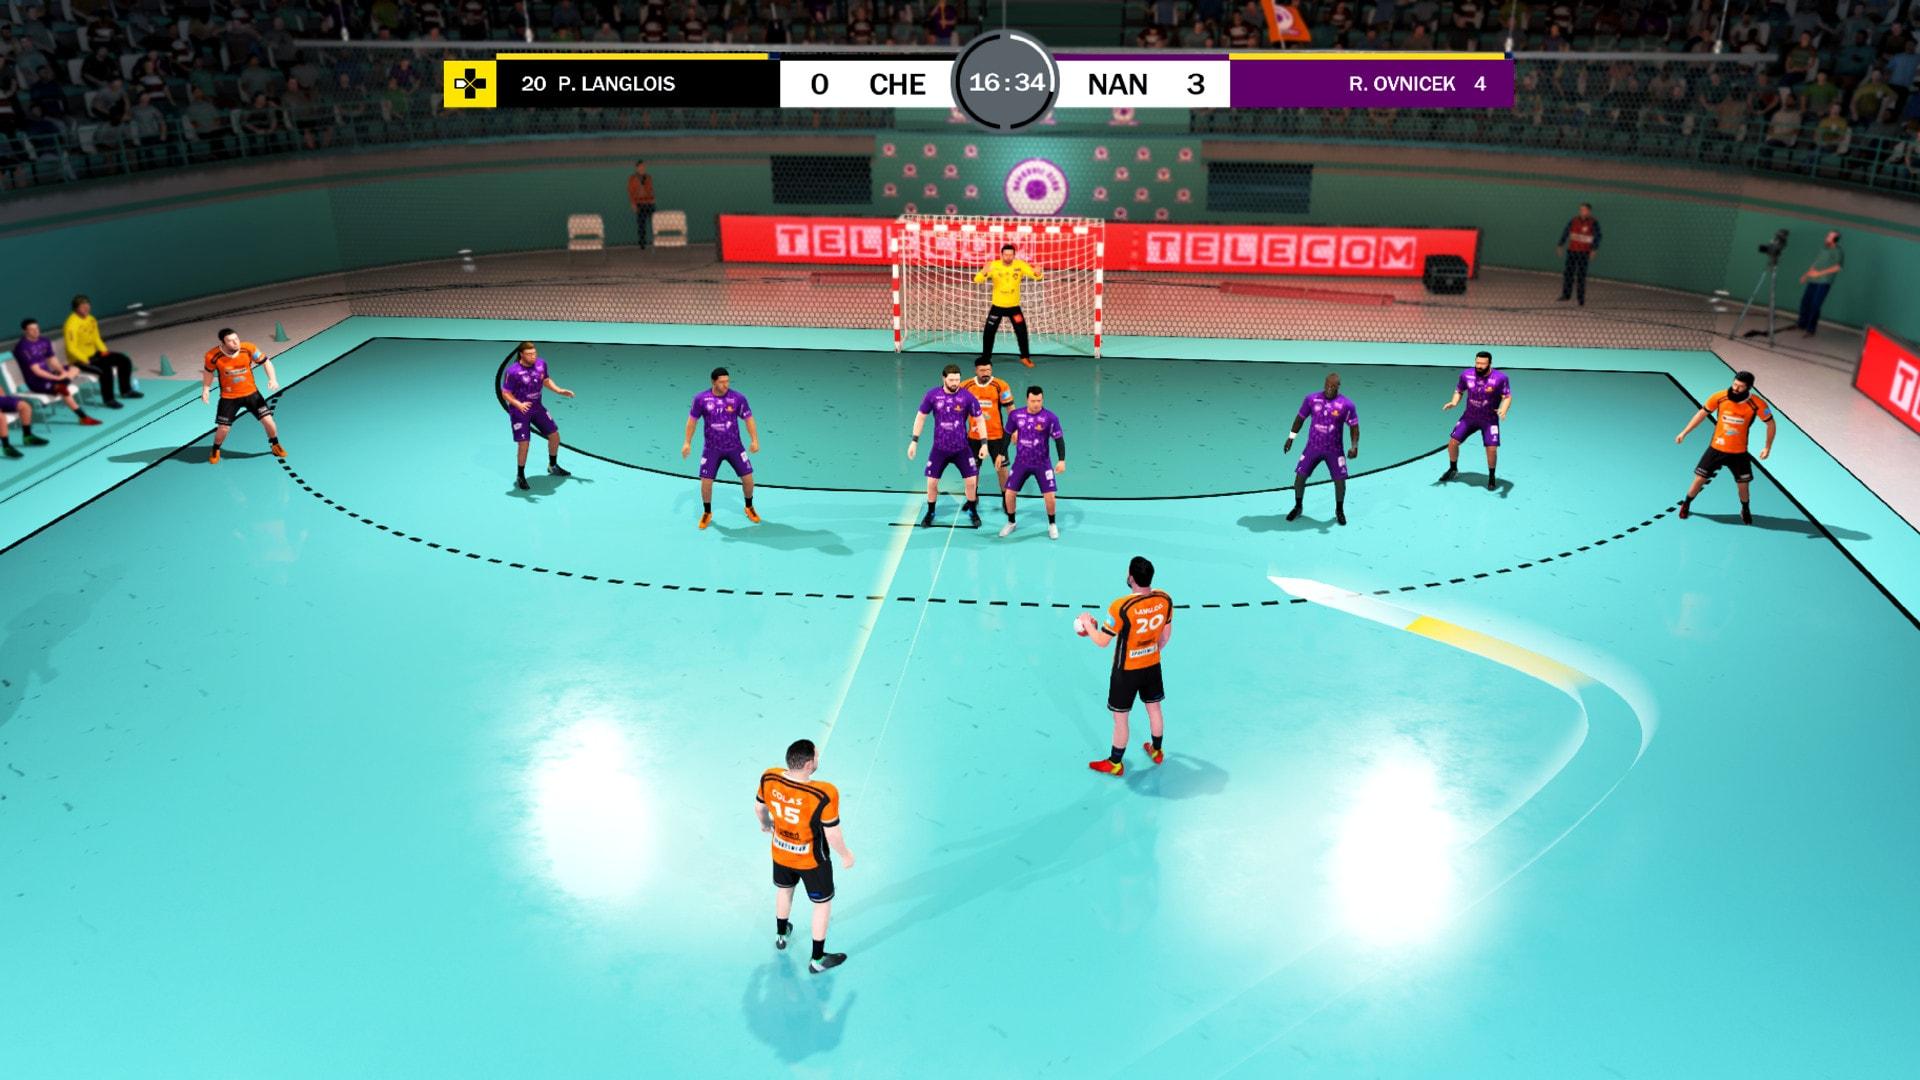 Handball 21 (PC) - Steam Gift - JAPAN - 4